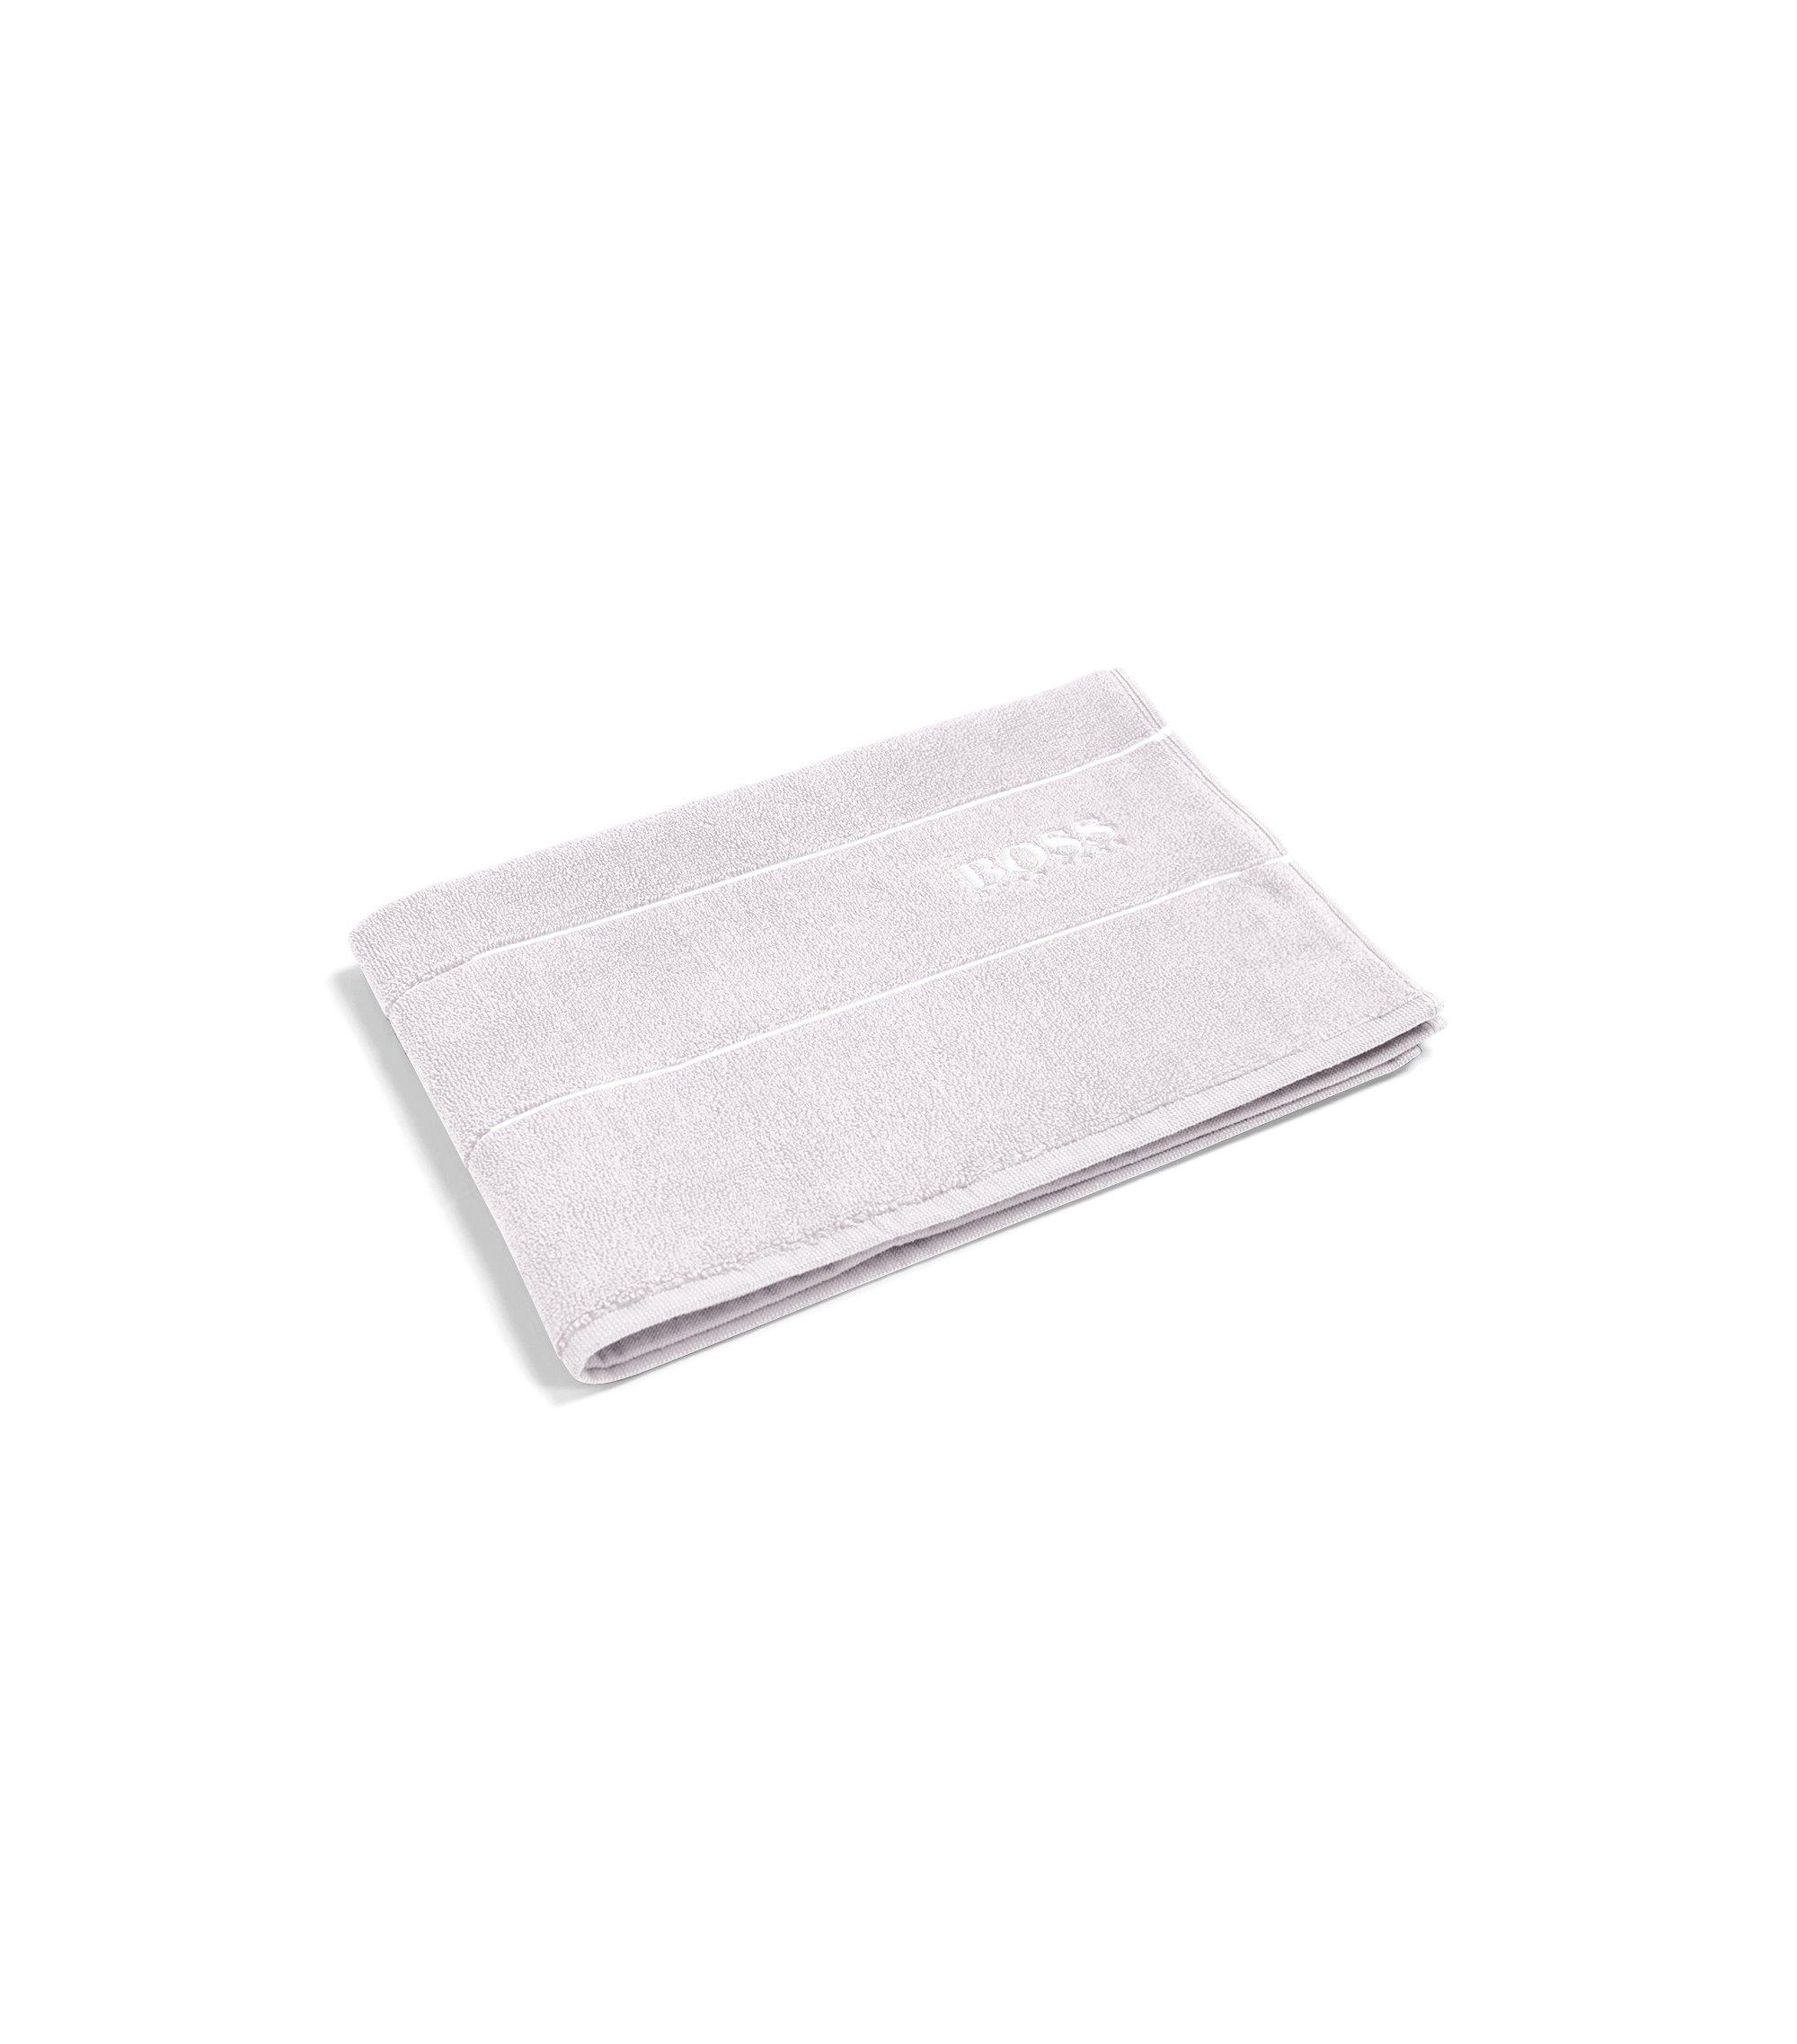 Finest Egyptian cotton bath mat with logo border, Silver